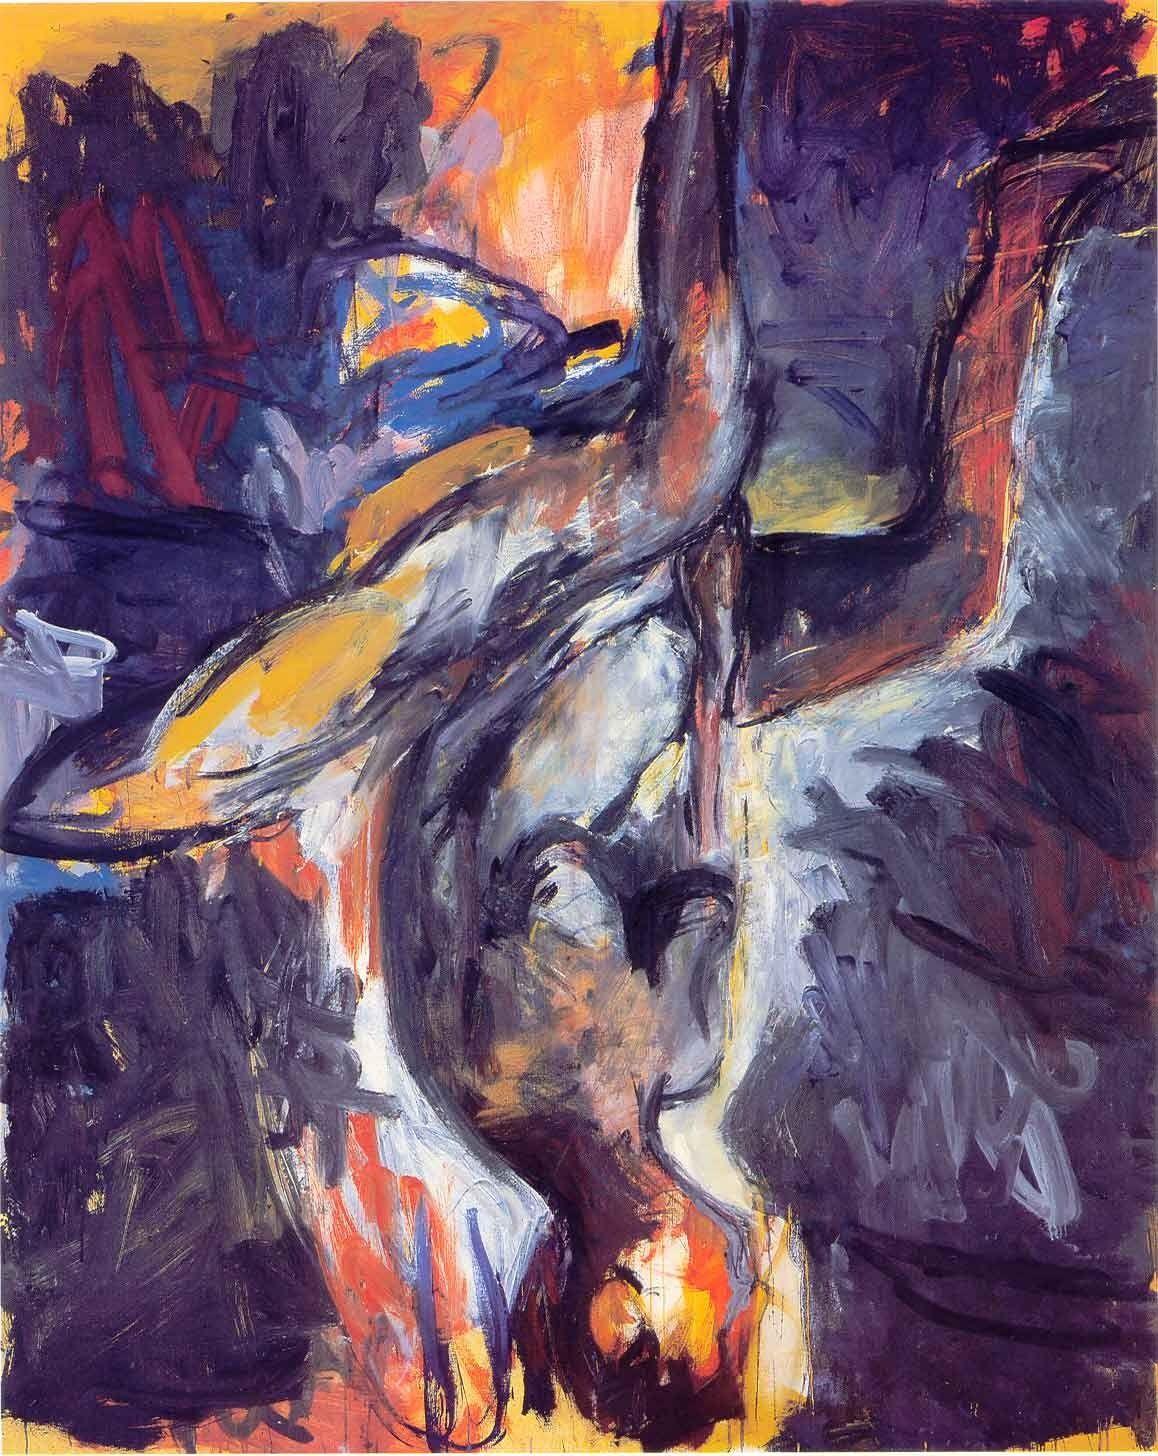 Georg Baselitz, Elke VI, 1976